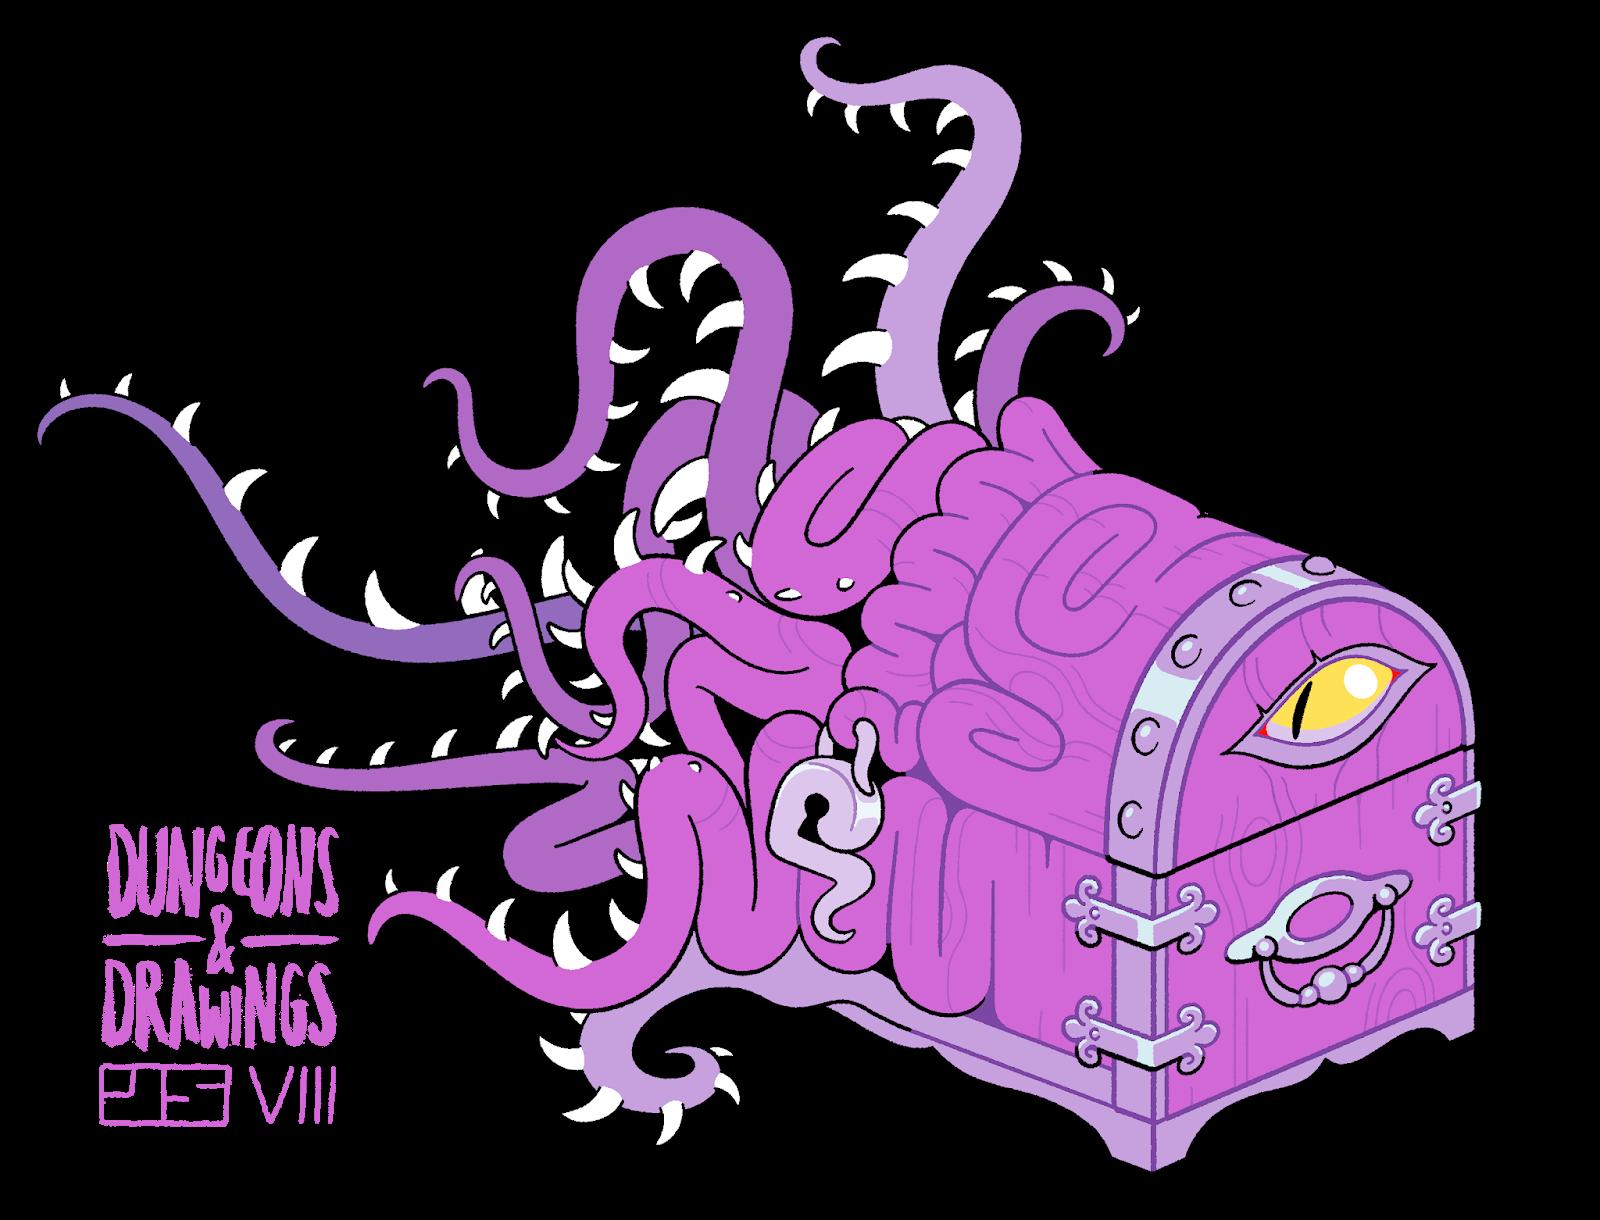 "dungeonsanddrawings ""Mimic Redux"" - by Joe Sparrow dungeonsanddrawings.blogspot.com (2018-11) © dell'autore tutti i diritti riservati"